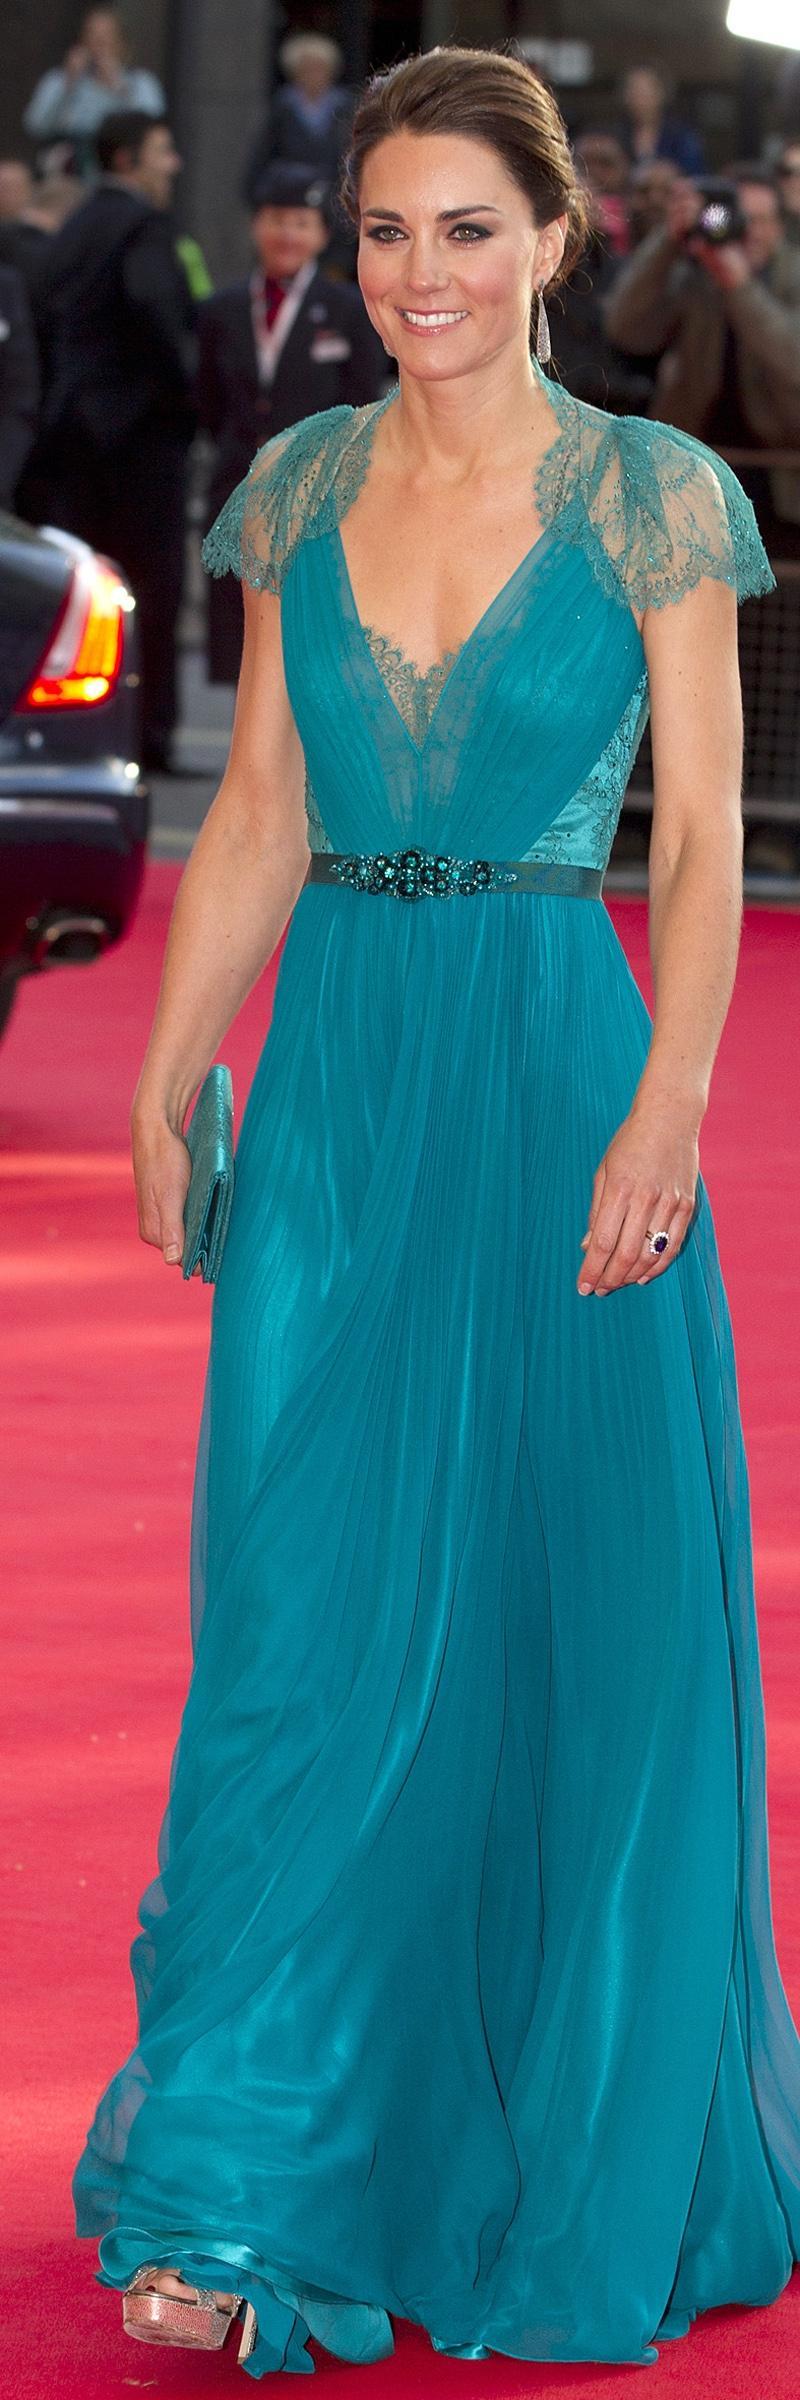 Duchess of Cambridge Makes Vanity Fair\'s Best-Dressed List (Again ...